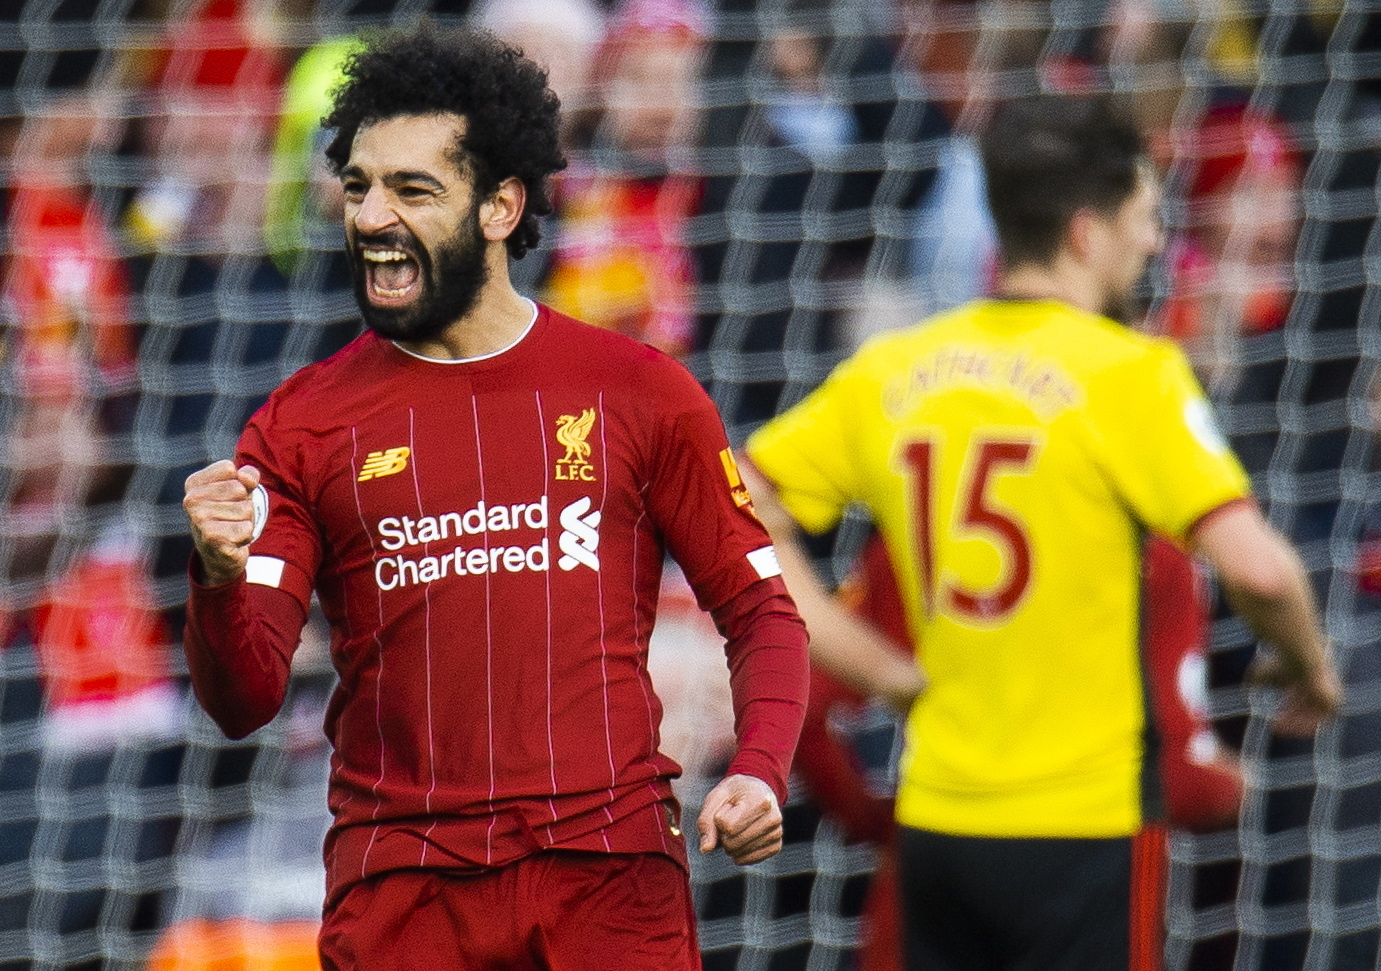 Liverpool vence Watford antes do Mundial de Clubes